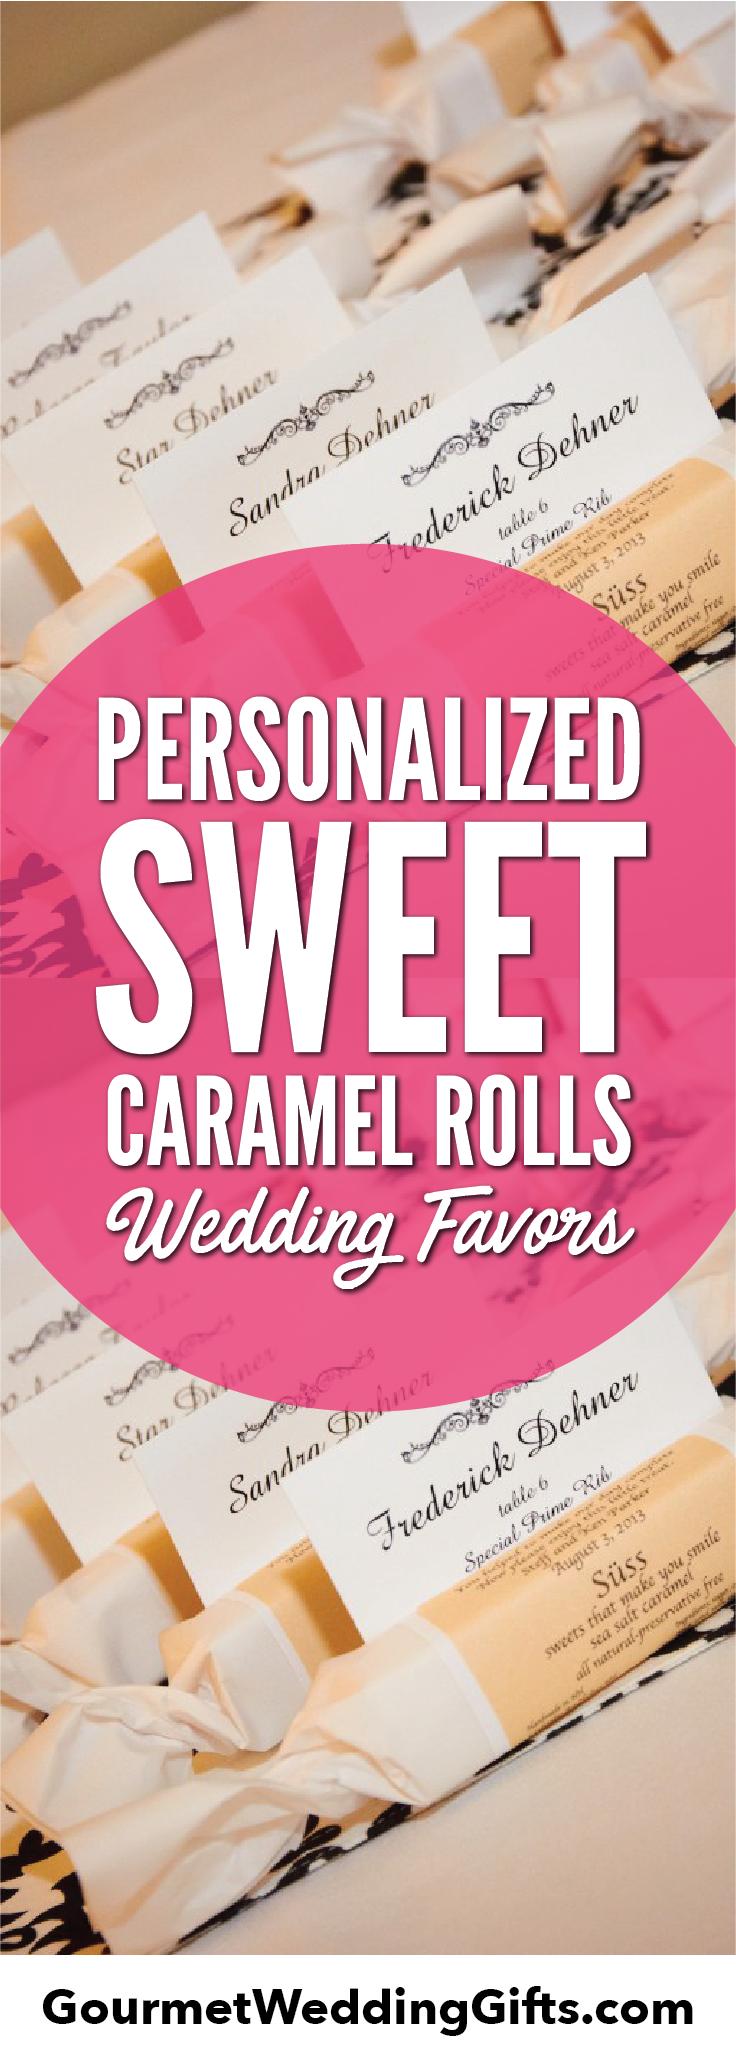 unique edible wedding favors   cute wedding ideas   personalized ...